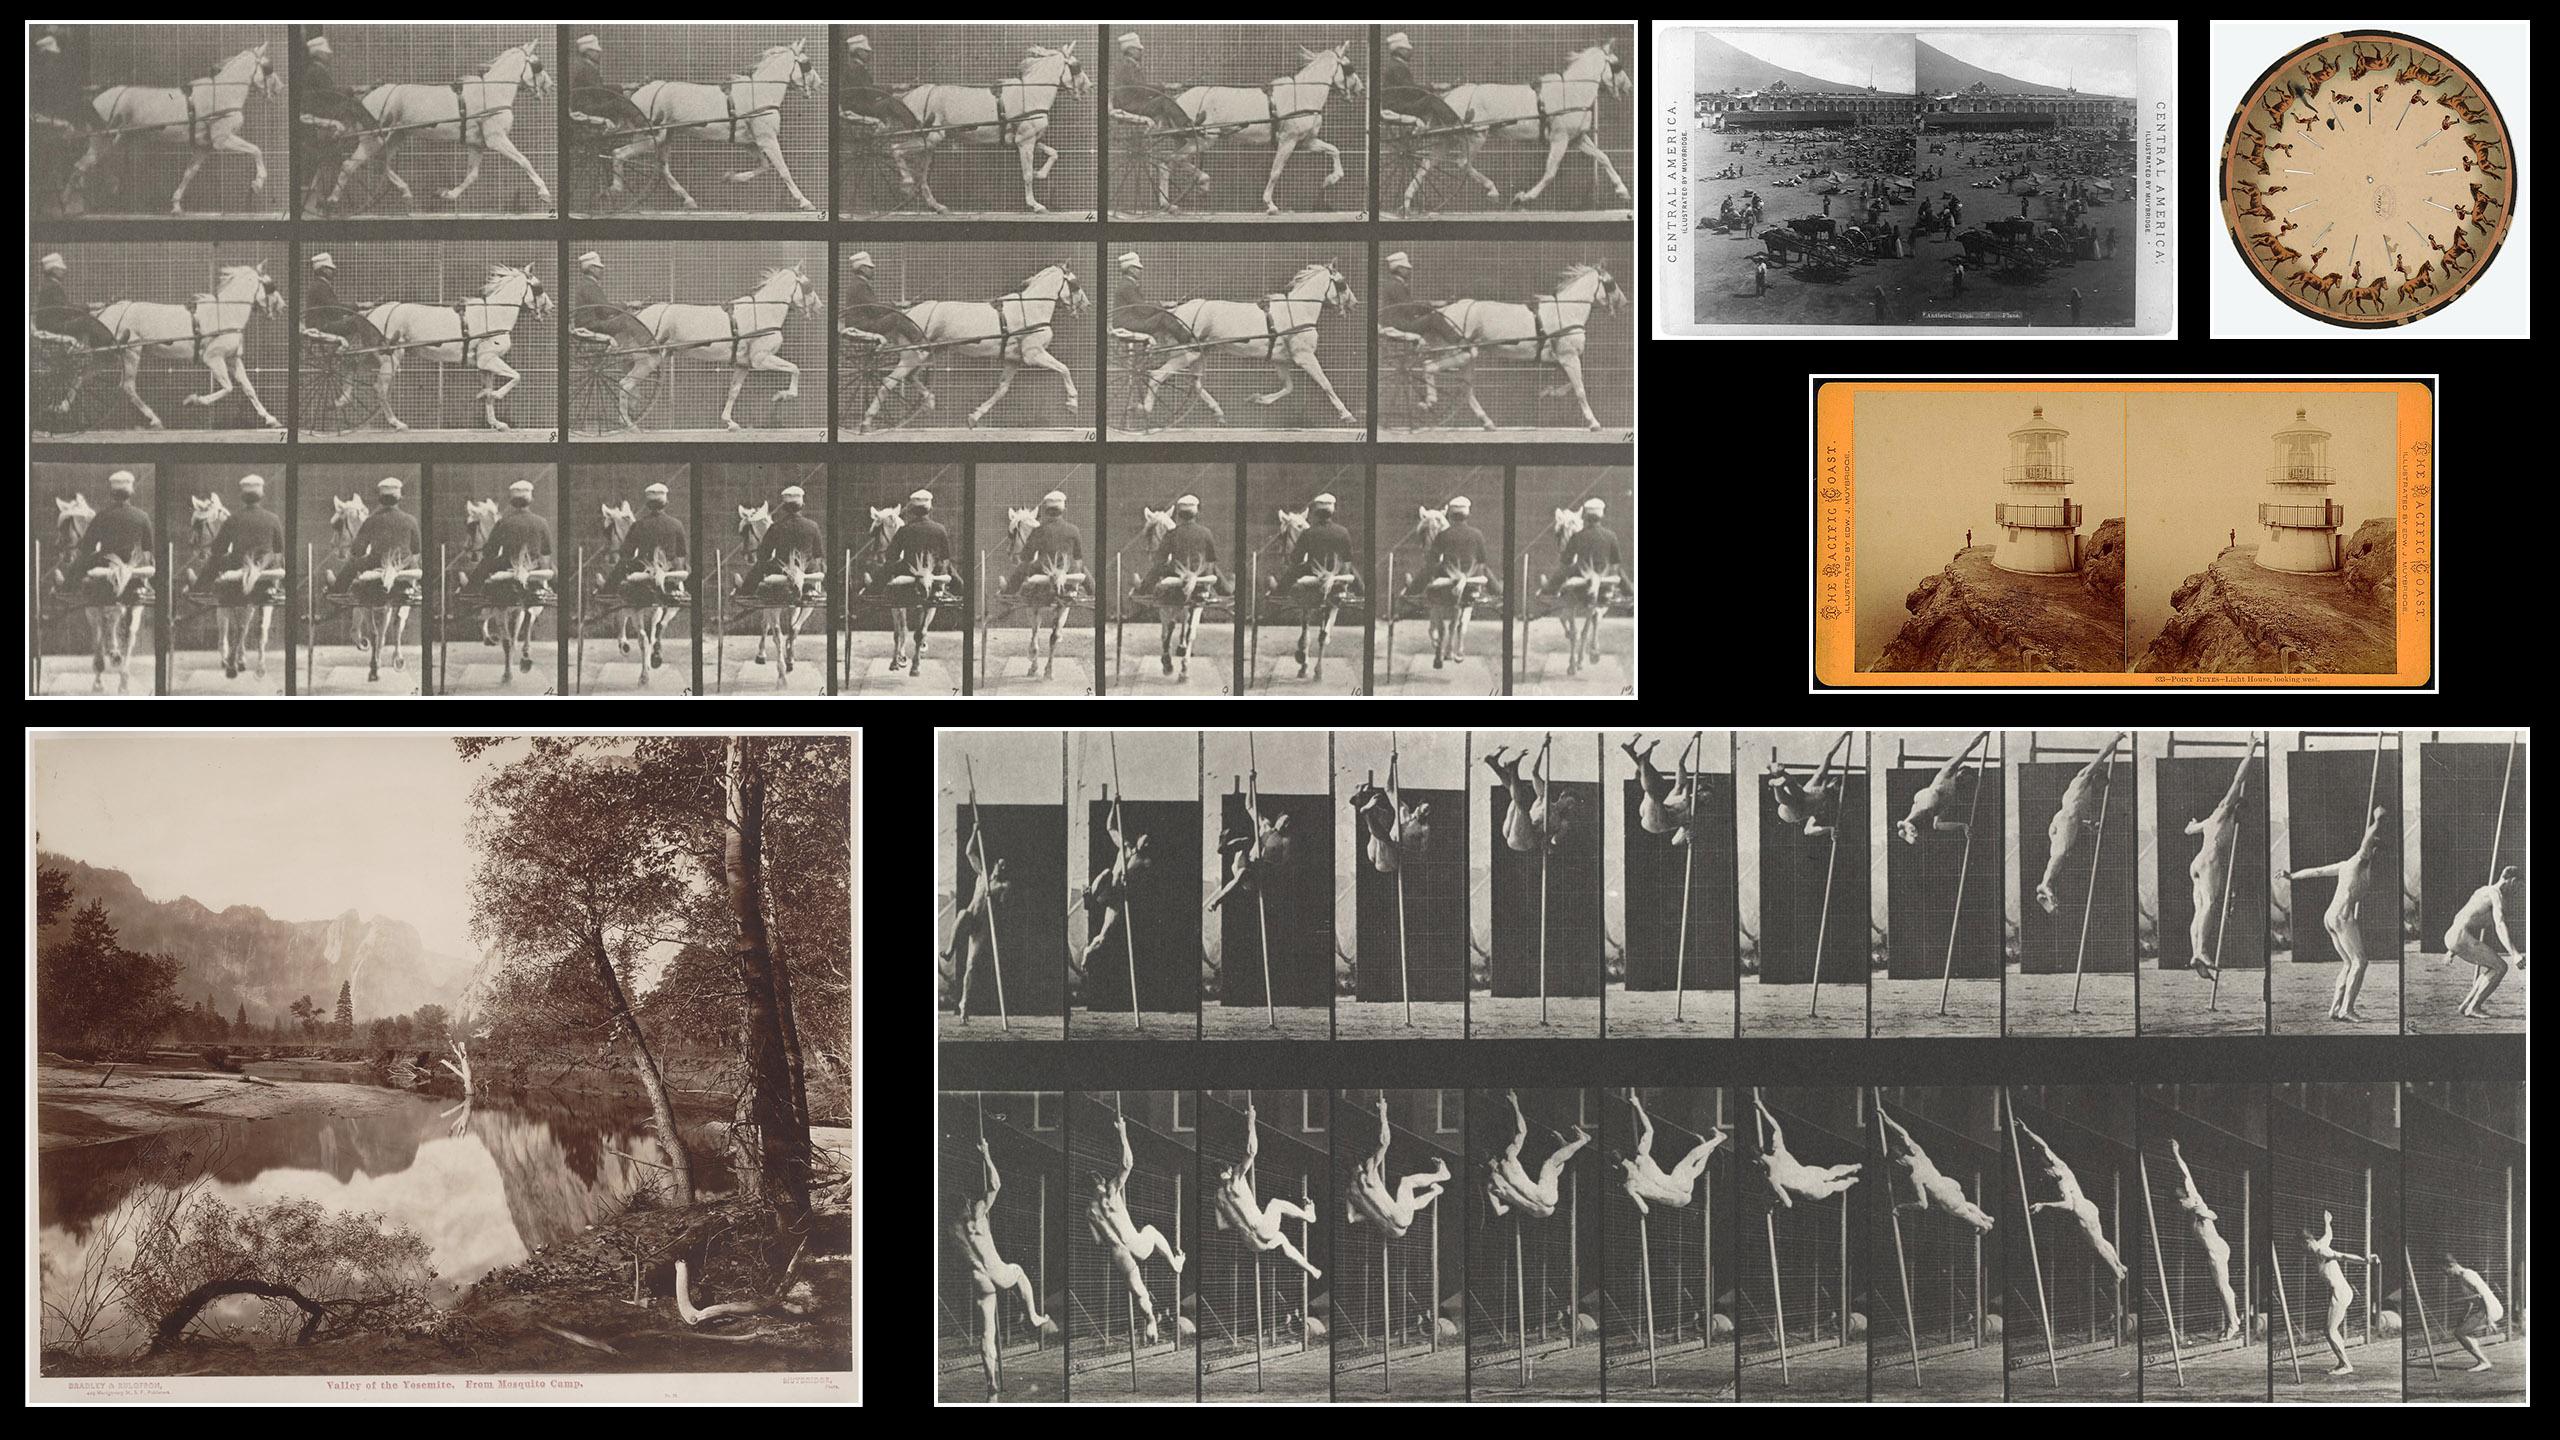 On Photography: Eadweard Muybridge, 1830-1904 | Photofocus